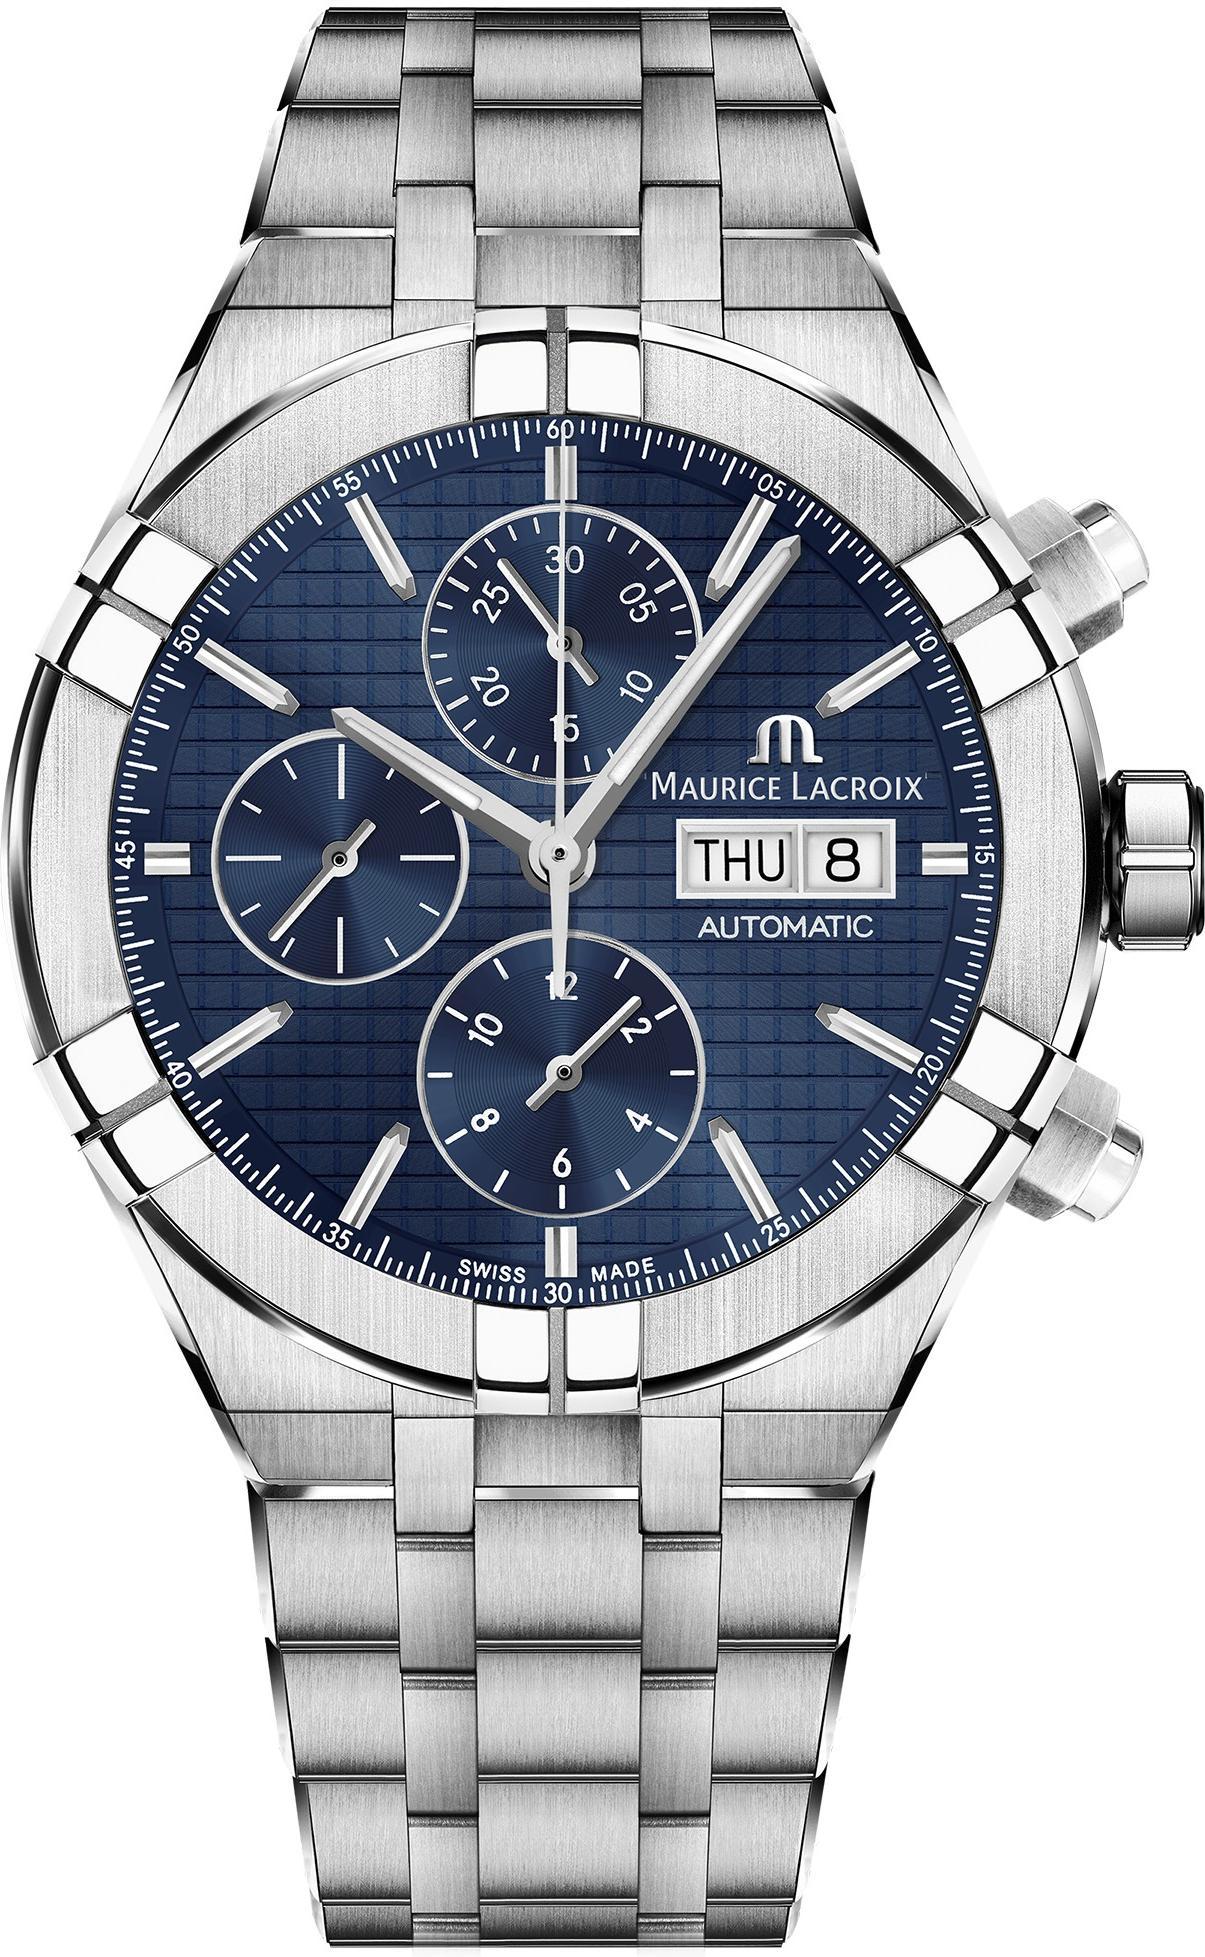 430 Herren Automatikchronograph Aikon Ss002 1 Lacroix Automatic Ai6038 Maurice Chronograph QdoreECxBW